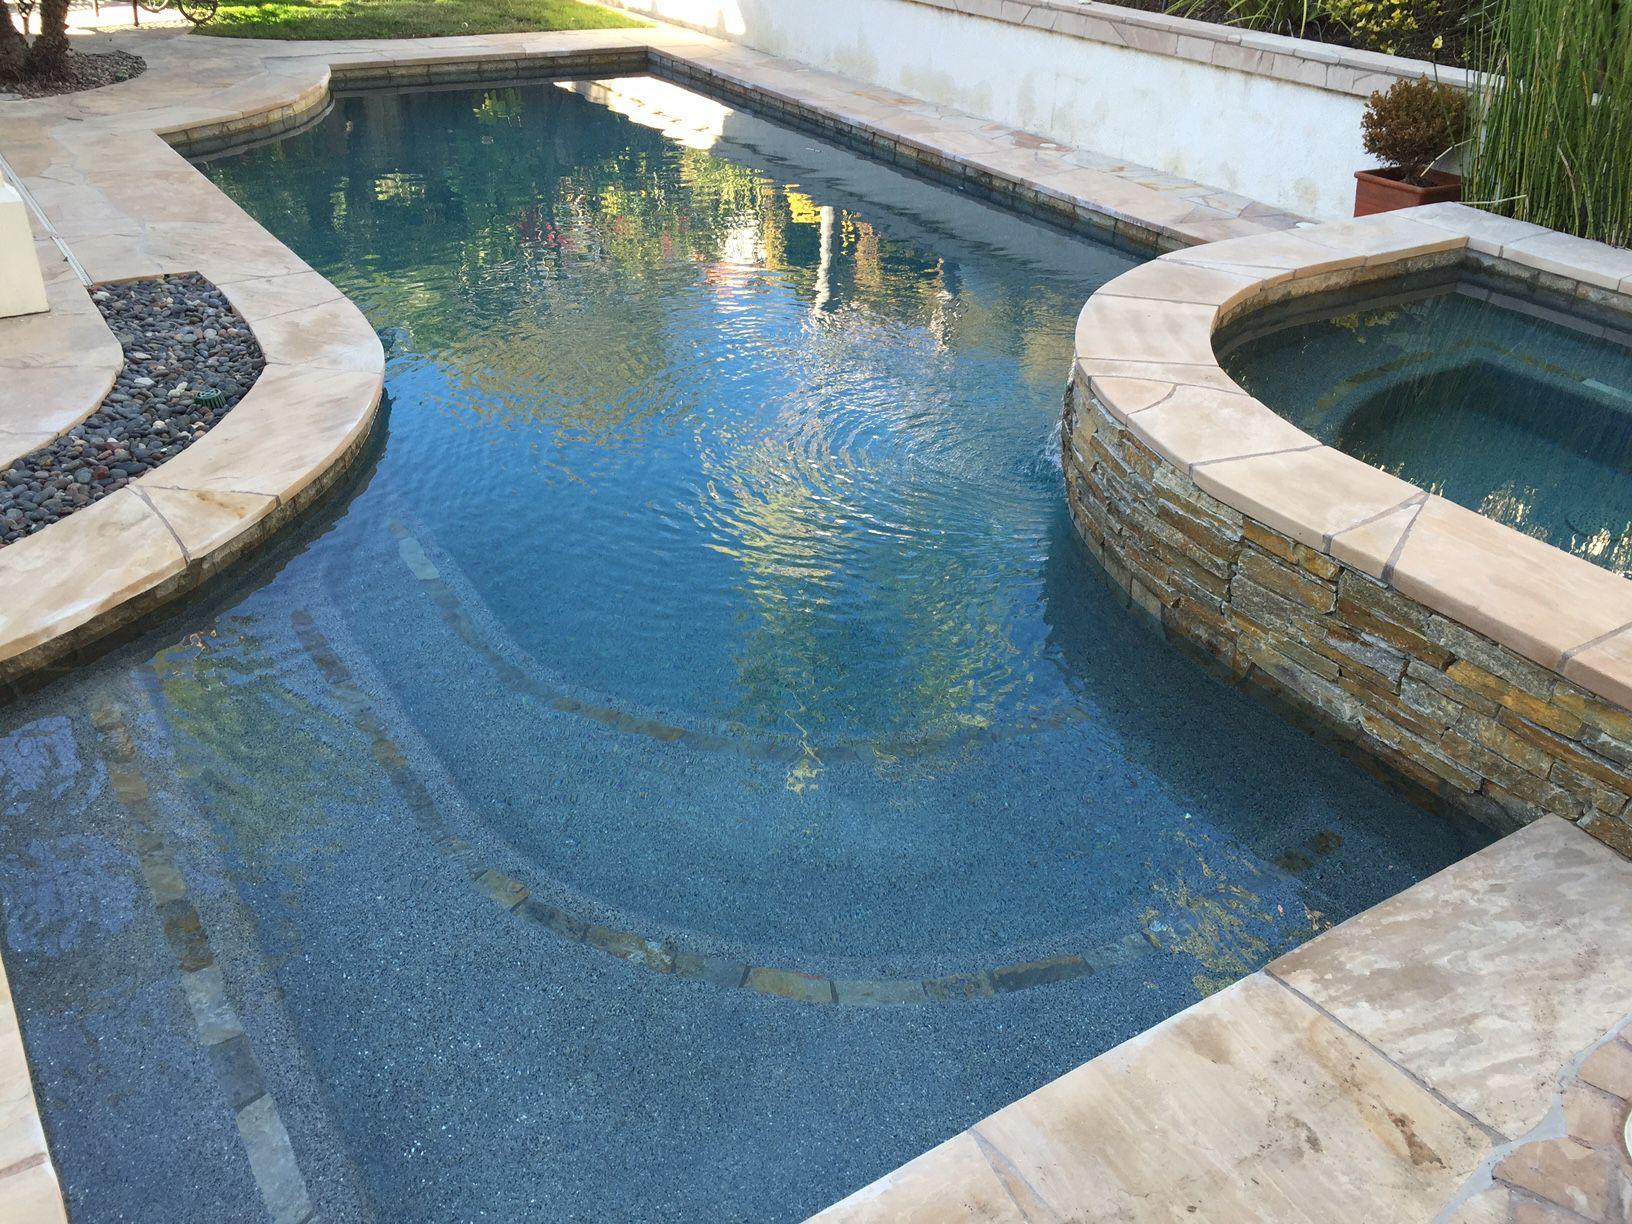 Pool Tiling - Swim Care Pool Services